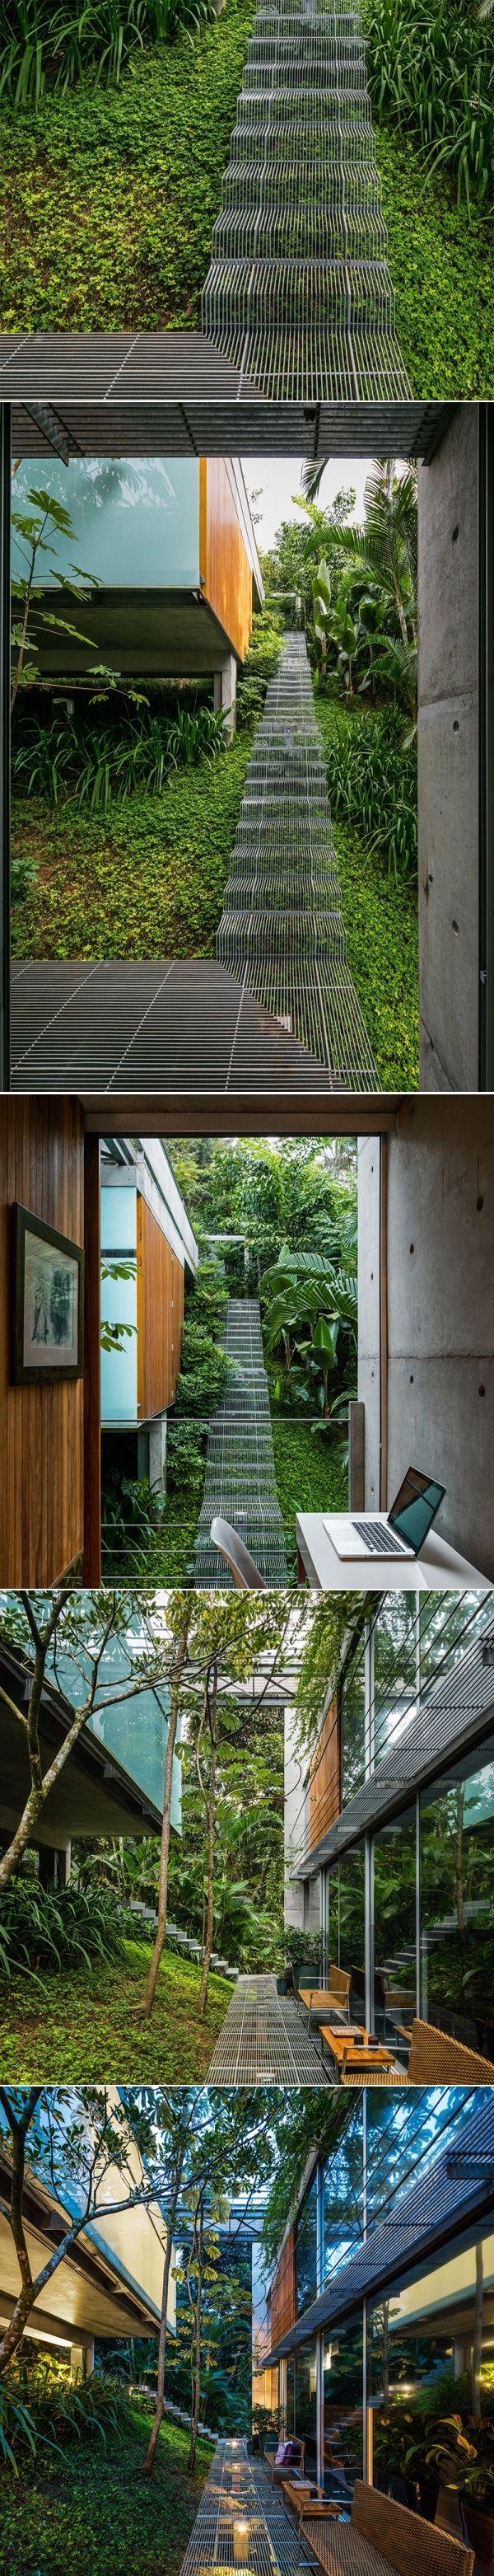 Landscape Design Idea – Low impact stairs that allow plants to grow below them | CONTEMPORIST